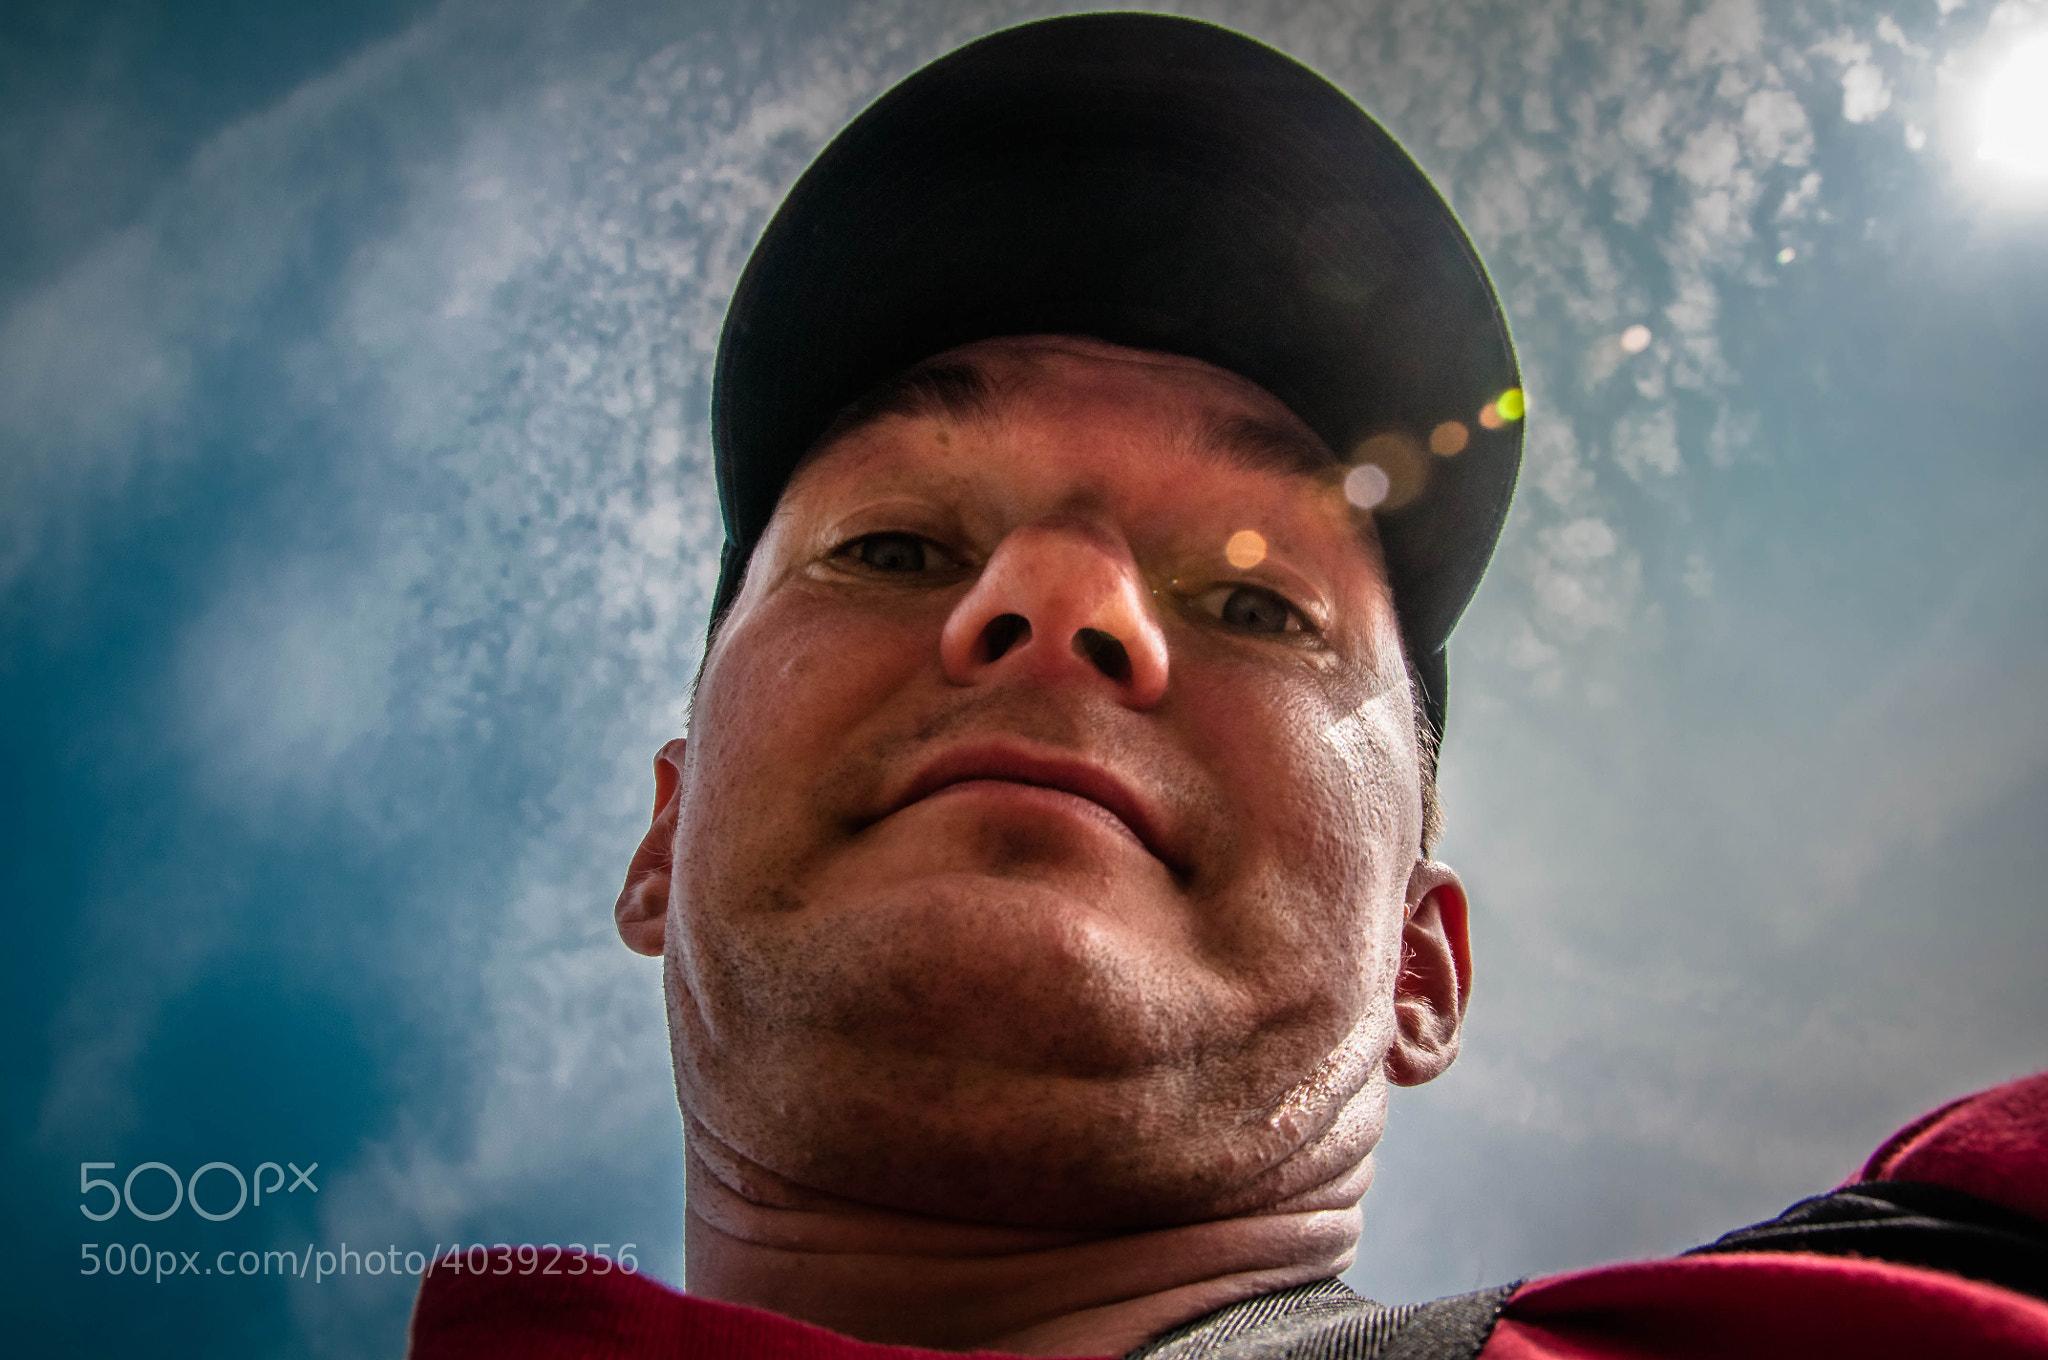 Photograph Selfie :) by Mariusz 'Mario TLR' Talarek on 500px